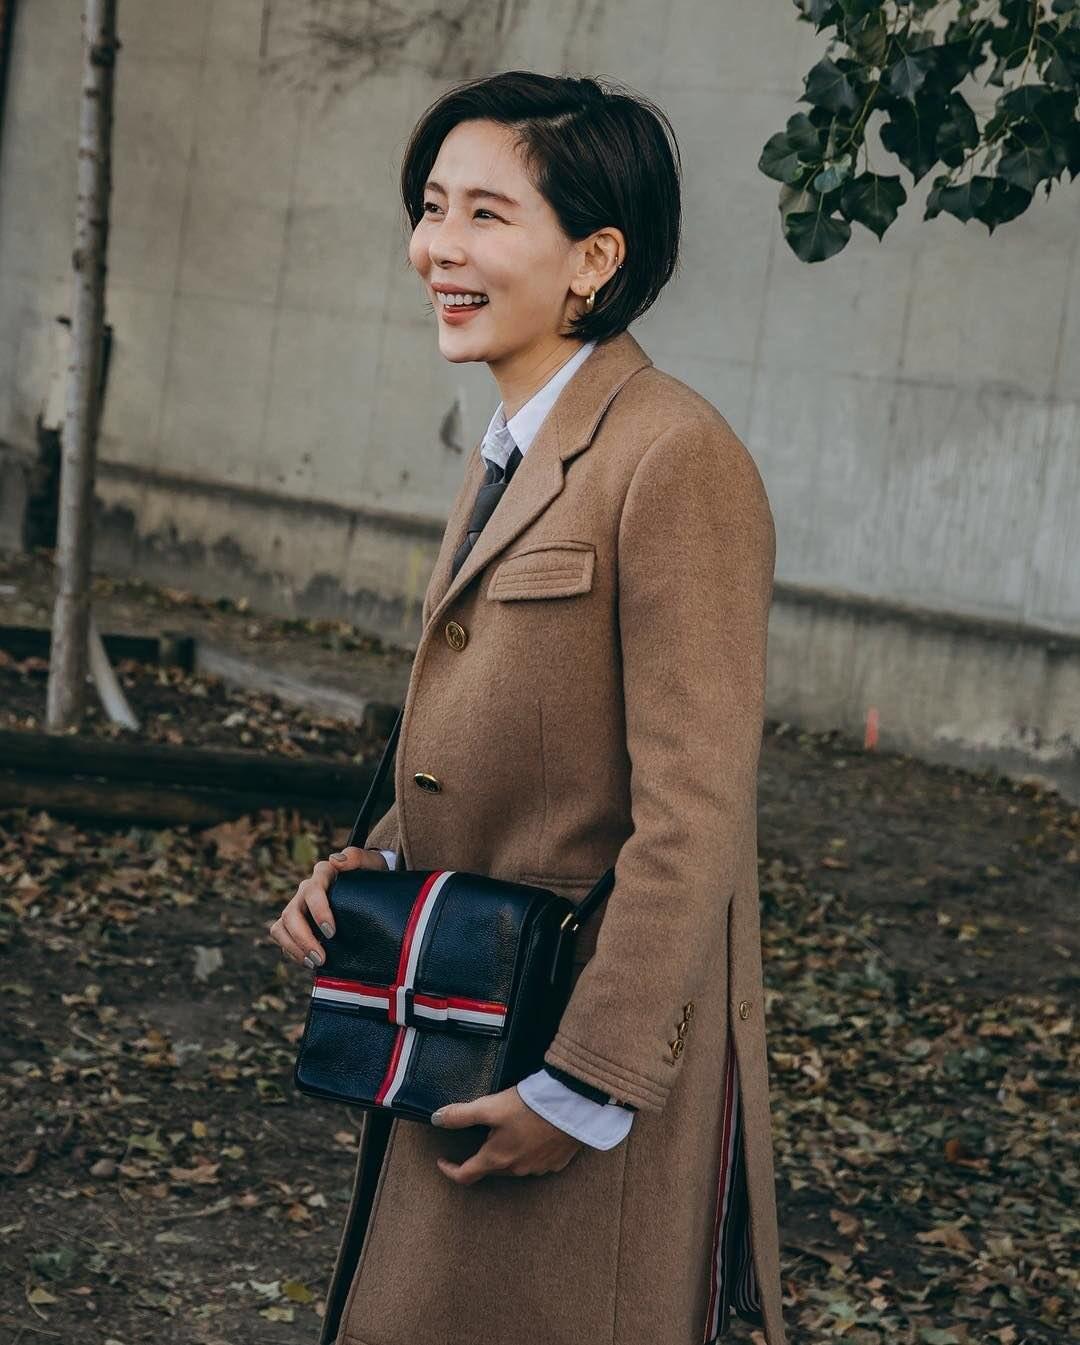 4KeZFPUuDmoCK2MYmQkkou.jpg 파리 패션위크 놀러간 김나영.JPG